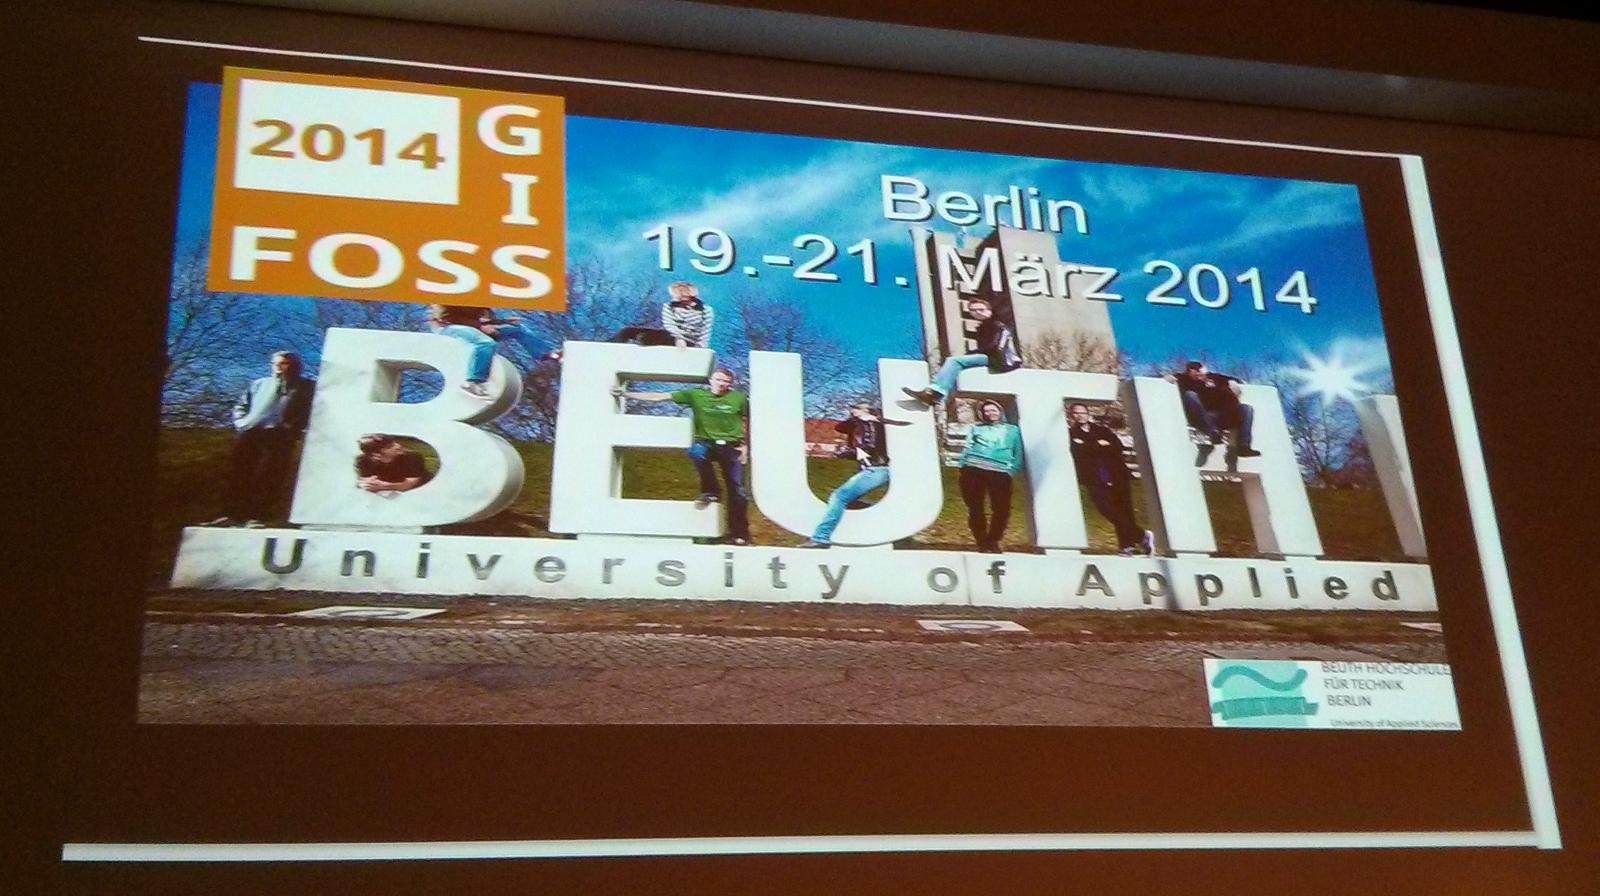 FOSSGIS 2014 in der Beuth Hochschule in Berlin (http://meggsimum.de)